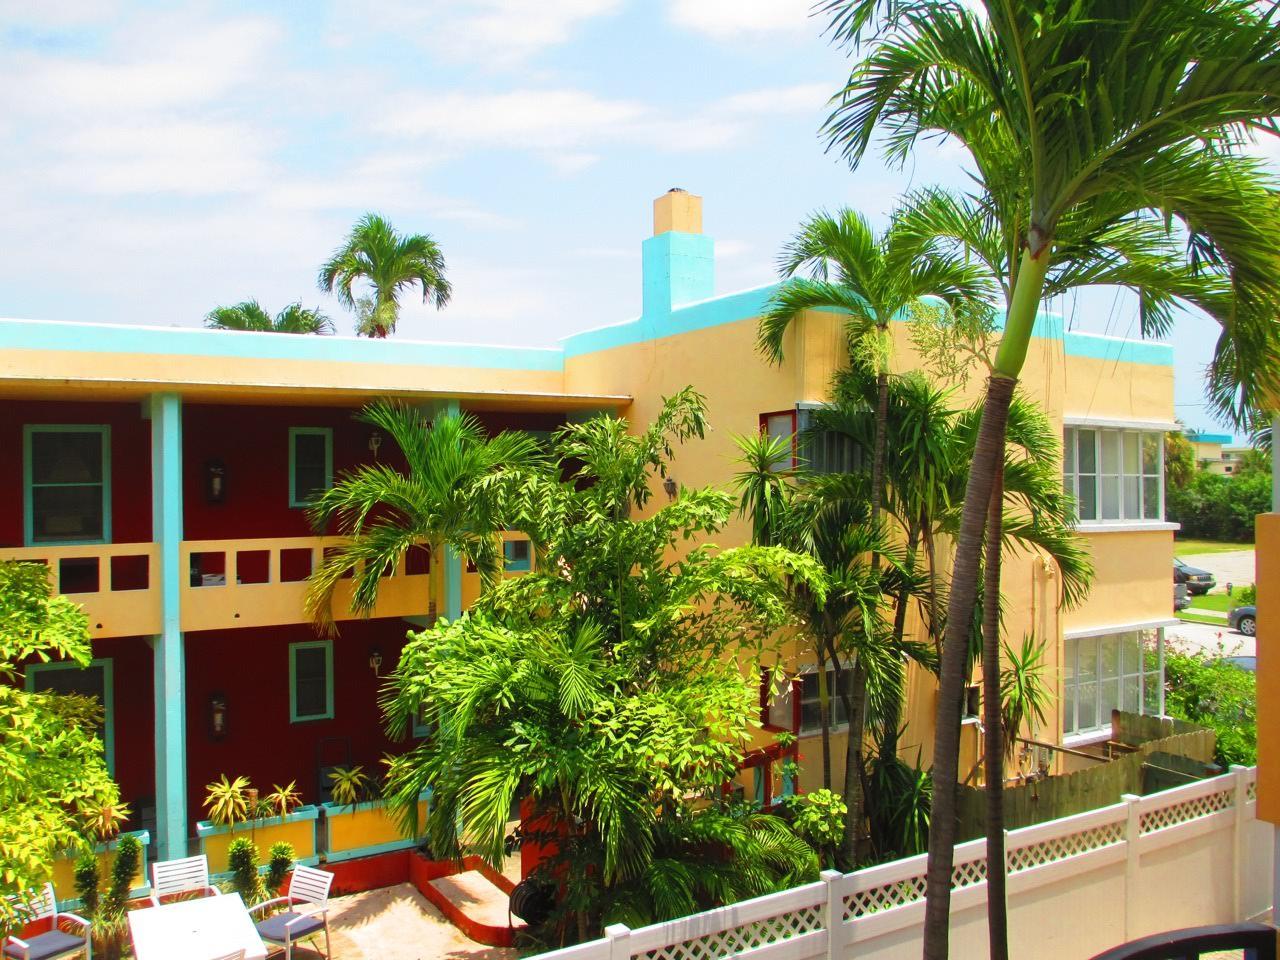 Wilton Manors, FL hurricane impact resistant windows and doors